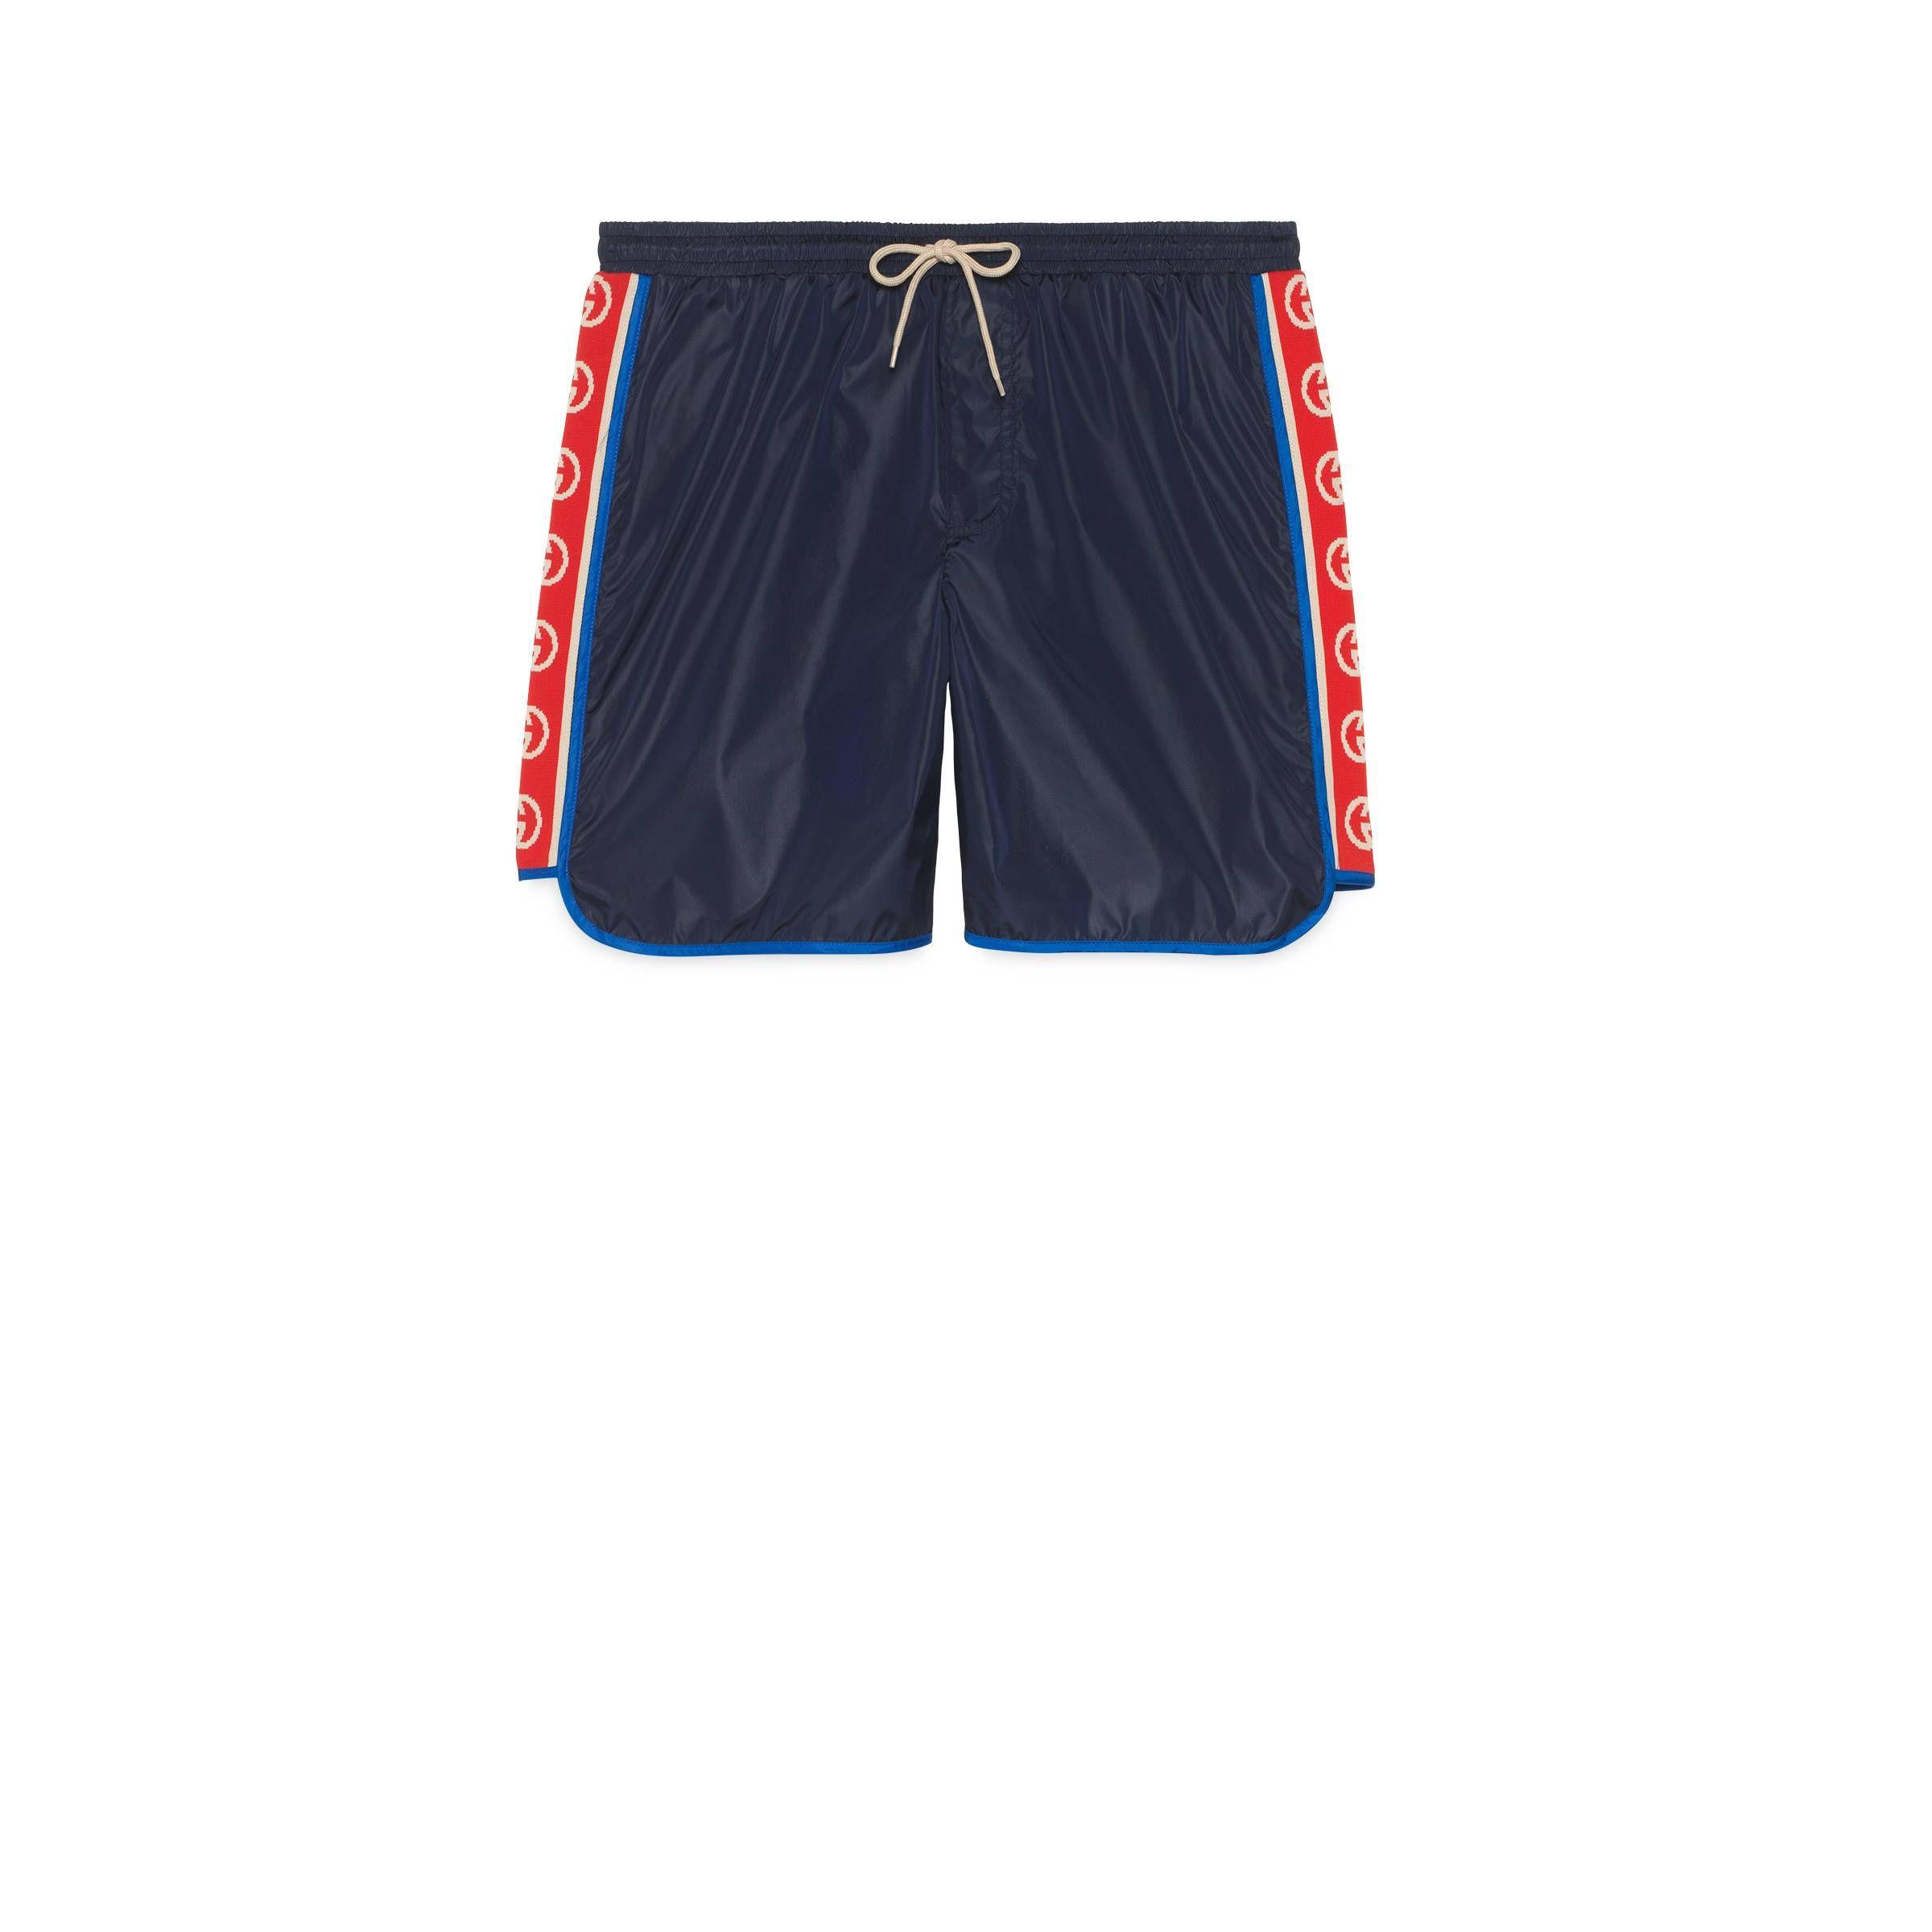 fb57dc7b7b GUCCI NYLON SWIM SHORTS WITH LOGO STRIPE. #gucci #cloth | Gucci in ...